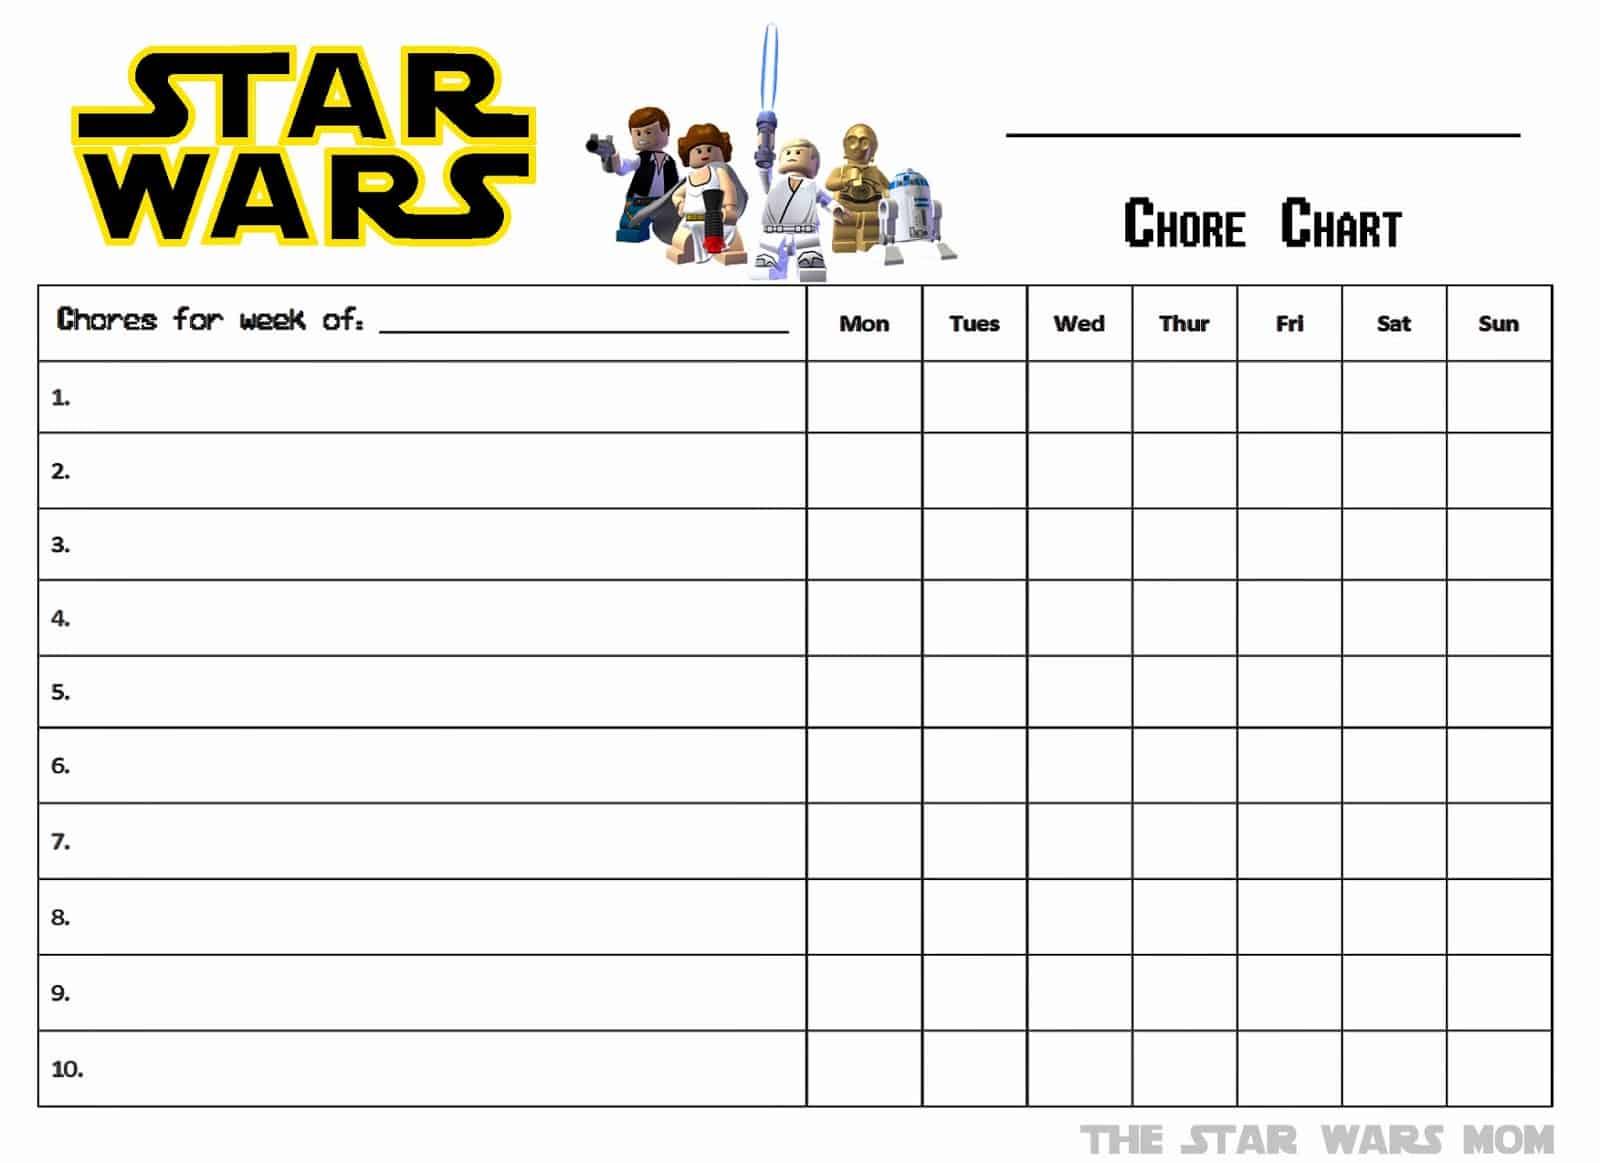 15 Printable Chore Charts To Keep The Kiddos Helpful